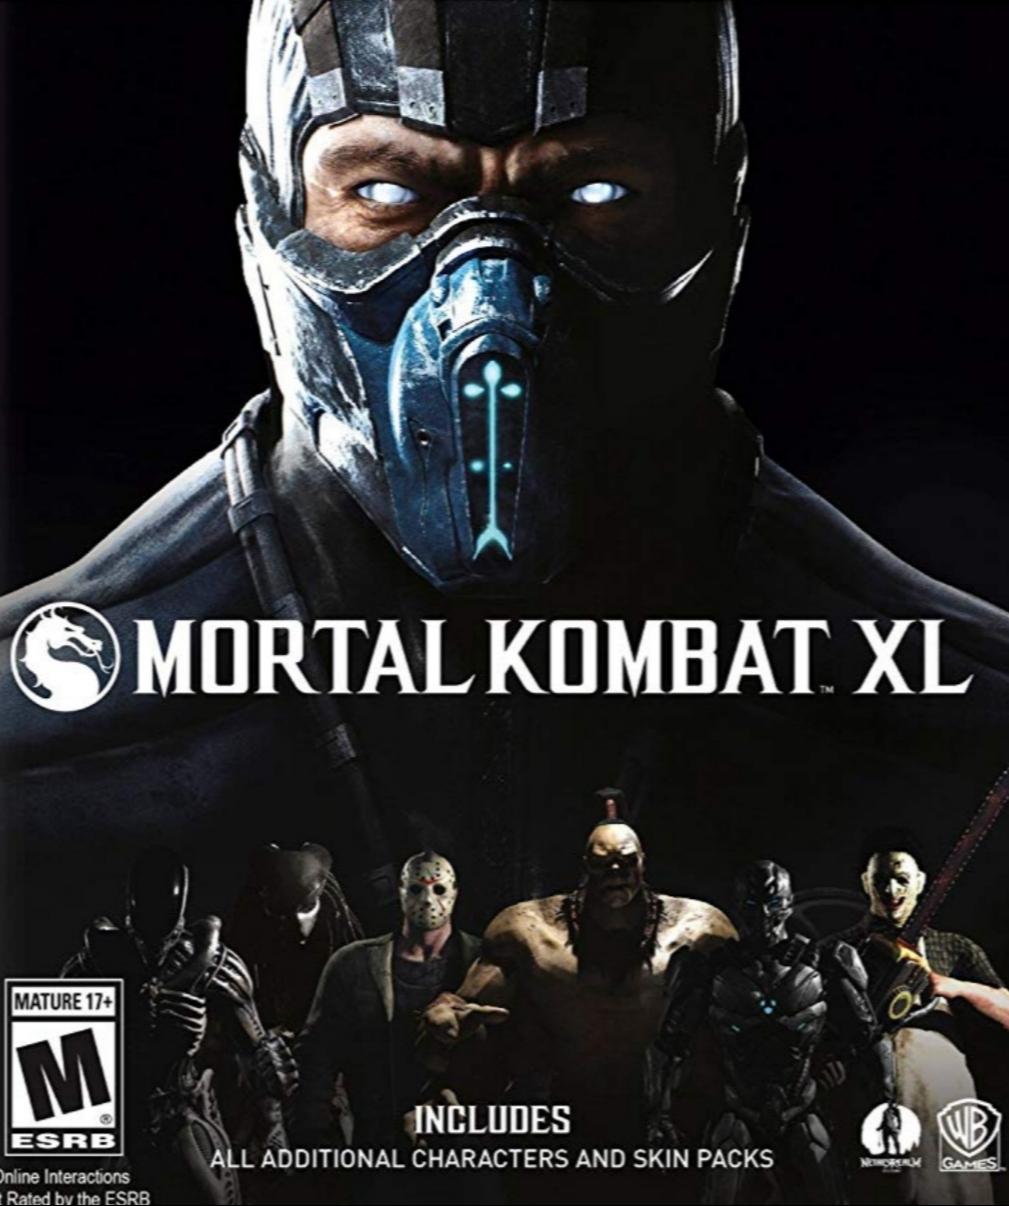 Mortal Kombat X (Video Game 2015) - IMDb